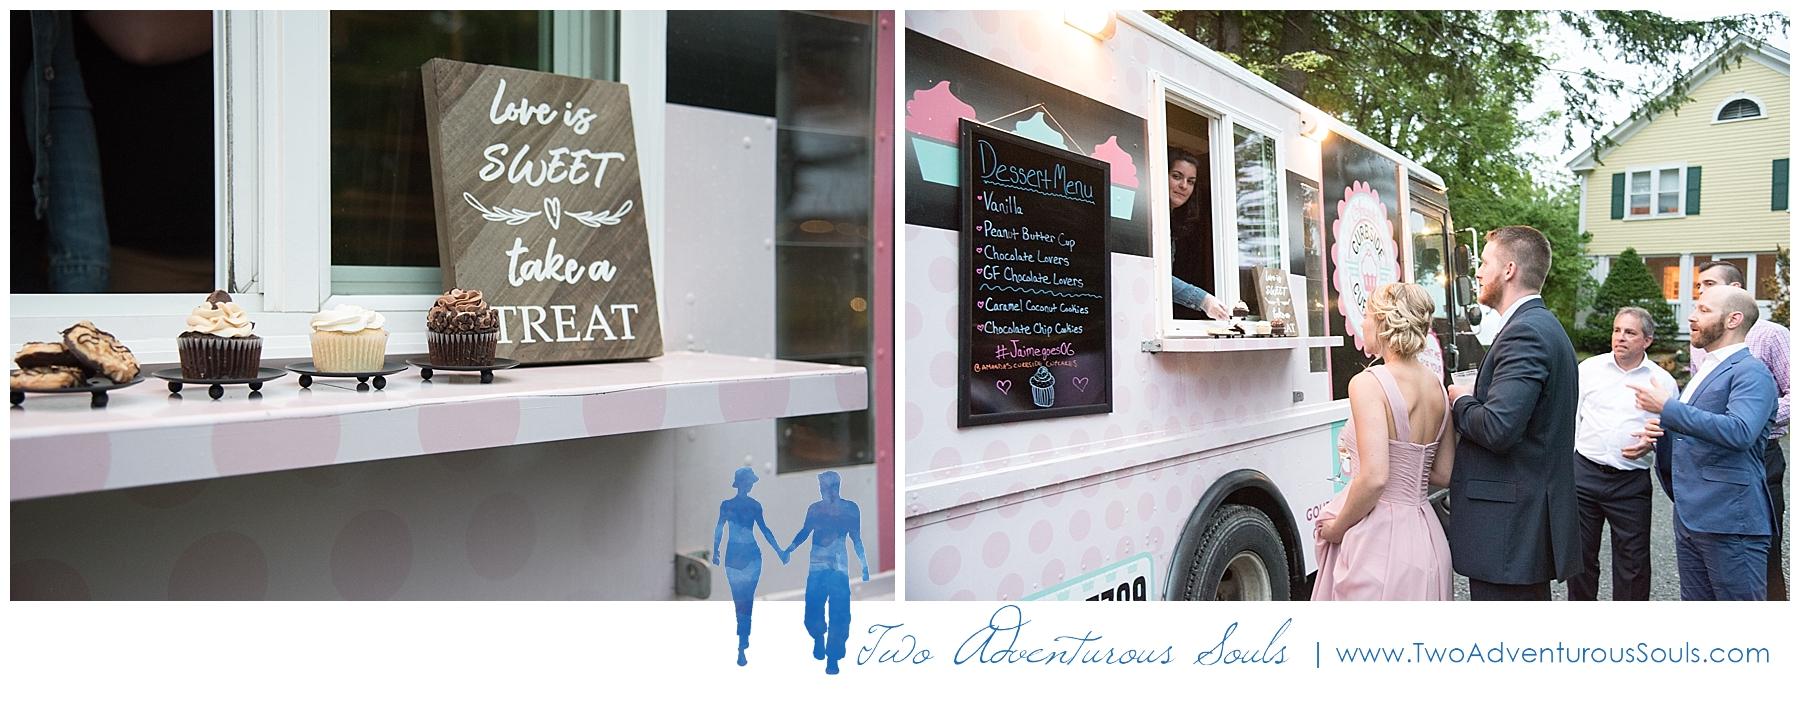 Dexter's Inn Wedding, New Hampshire Wedding Photographers_Food Truck Wedding with cupcake Truck